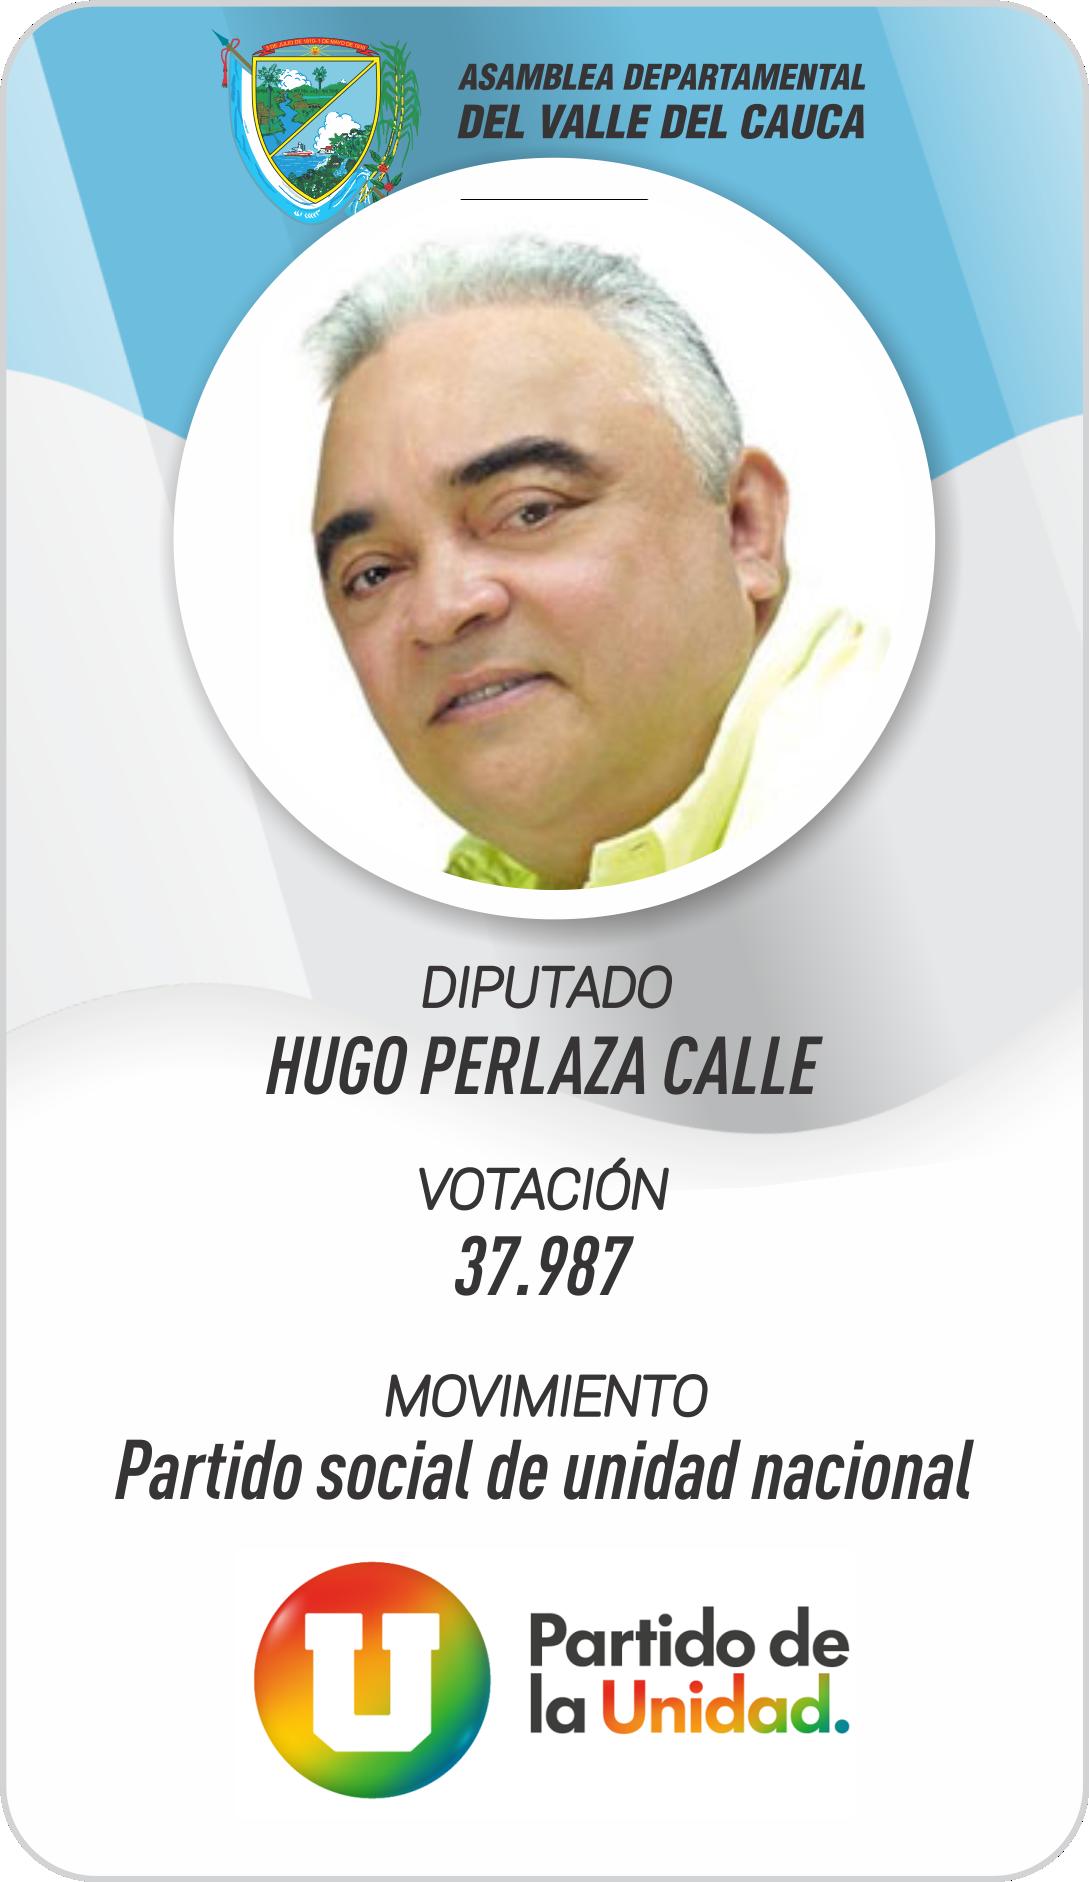 HUGO PERLAZA CALLE